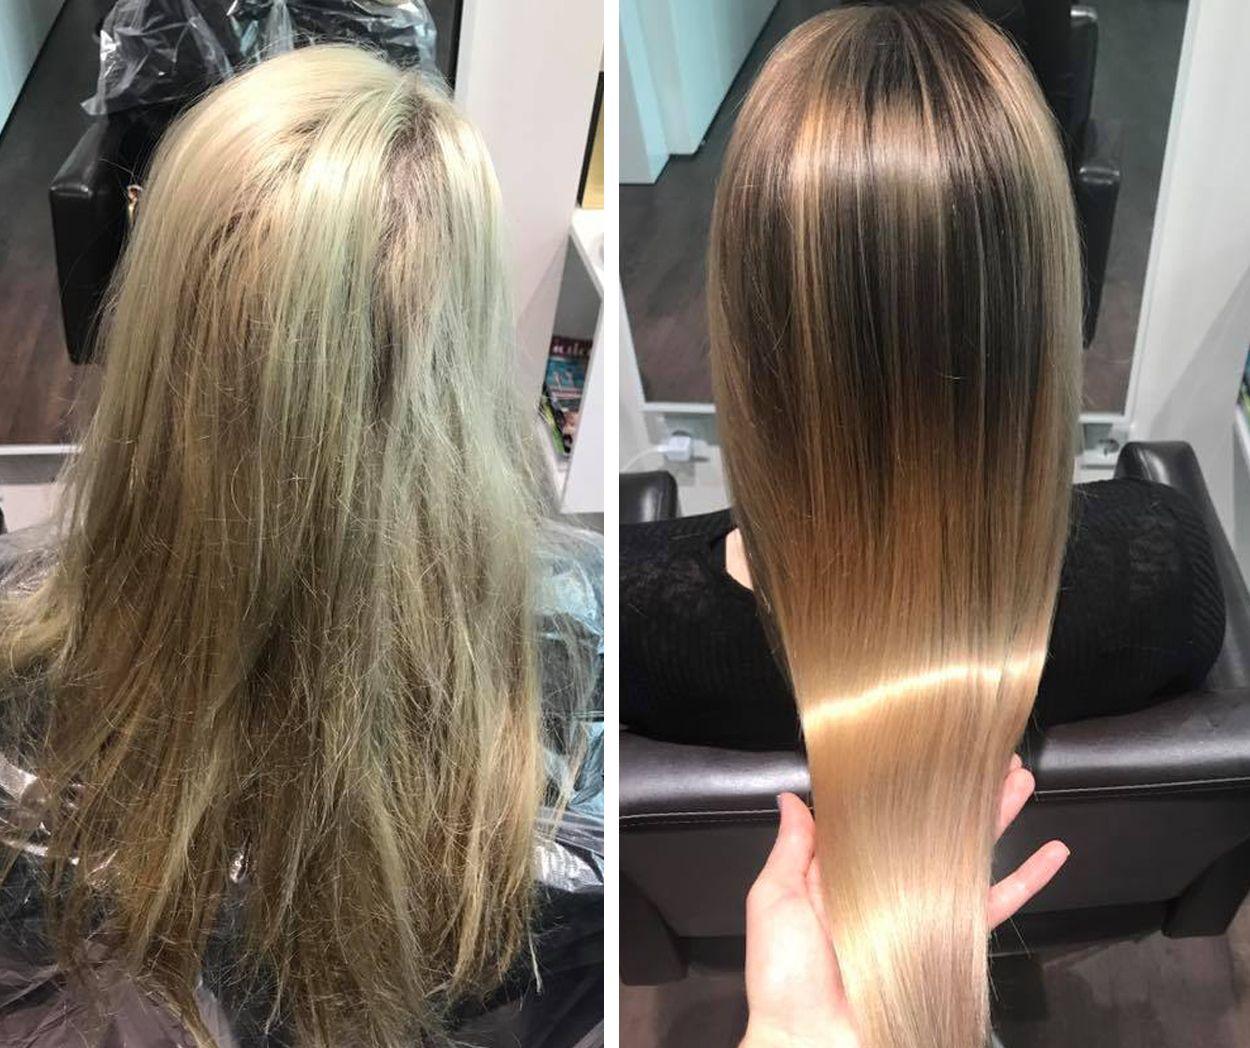 Hair Color Haircare Frisuren Langhaar Friseur Berlin Bunte Haare